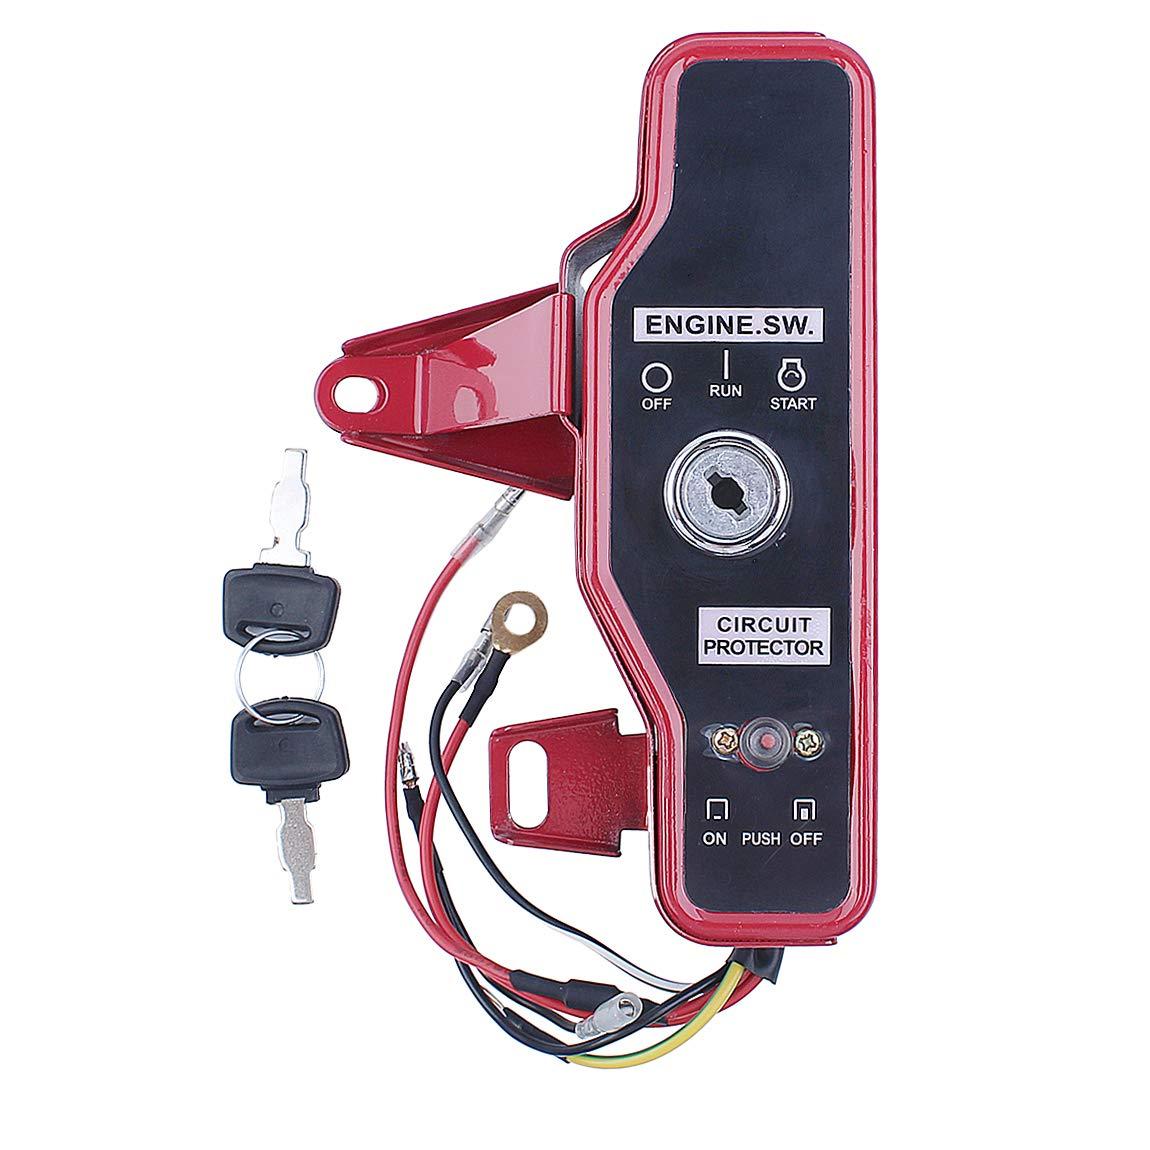 Haishine Ignition Switch Box with Keys Fit Honda GX160 GX200 5.5HP 6.5HP Engine & Clone by Haishine